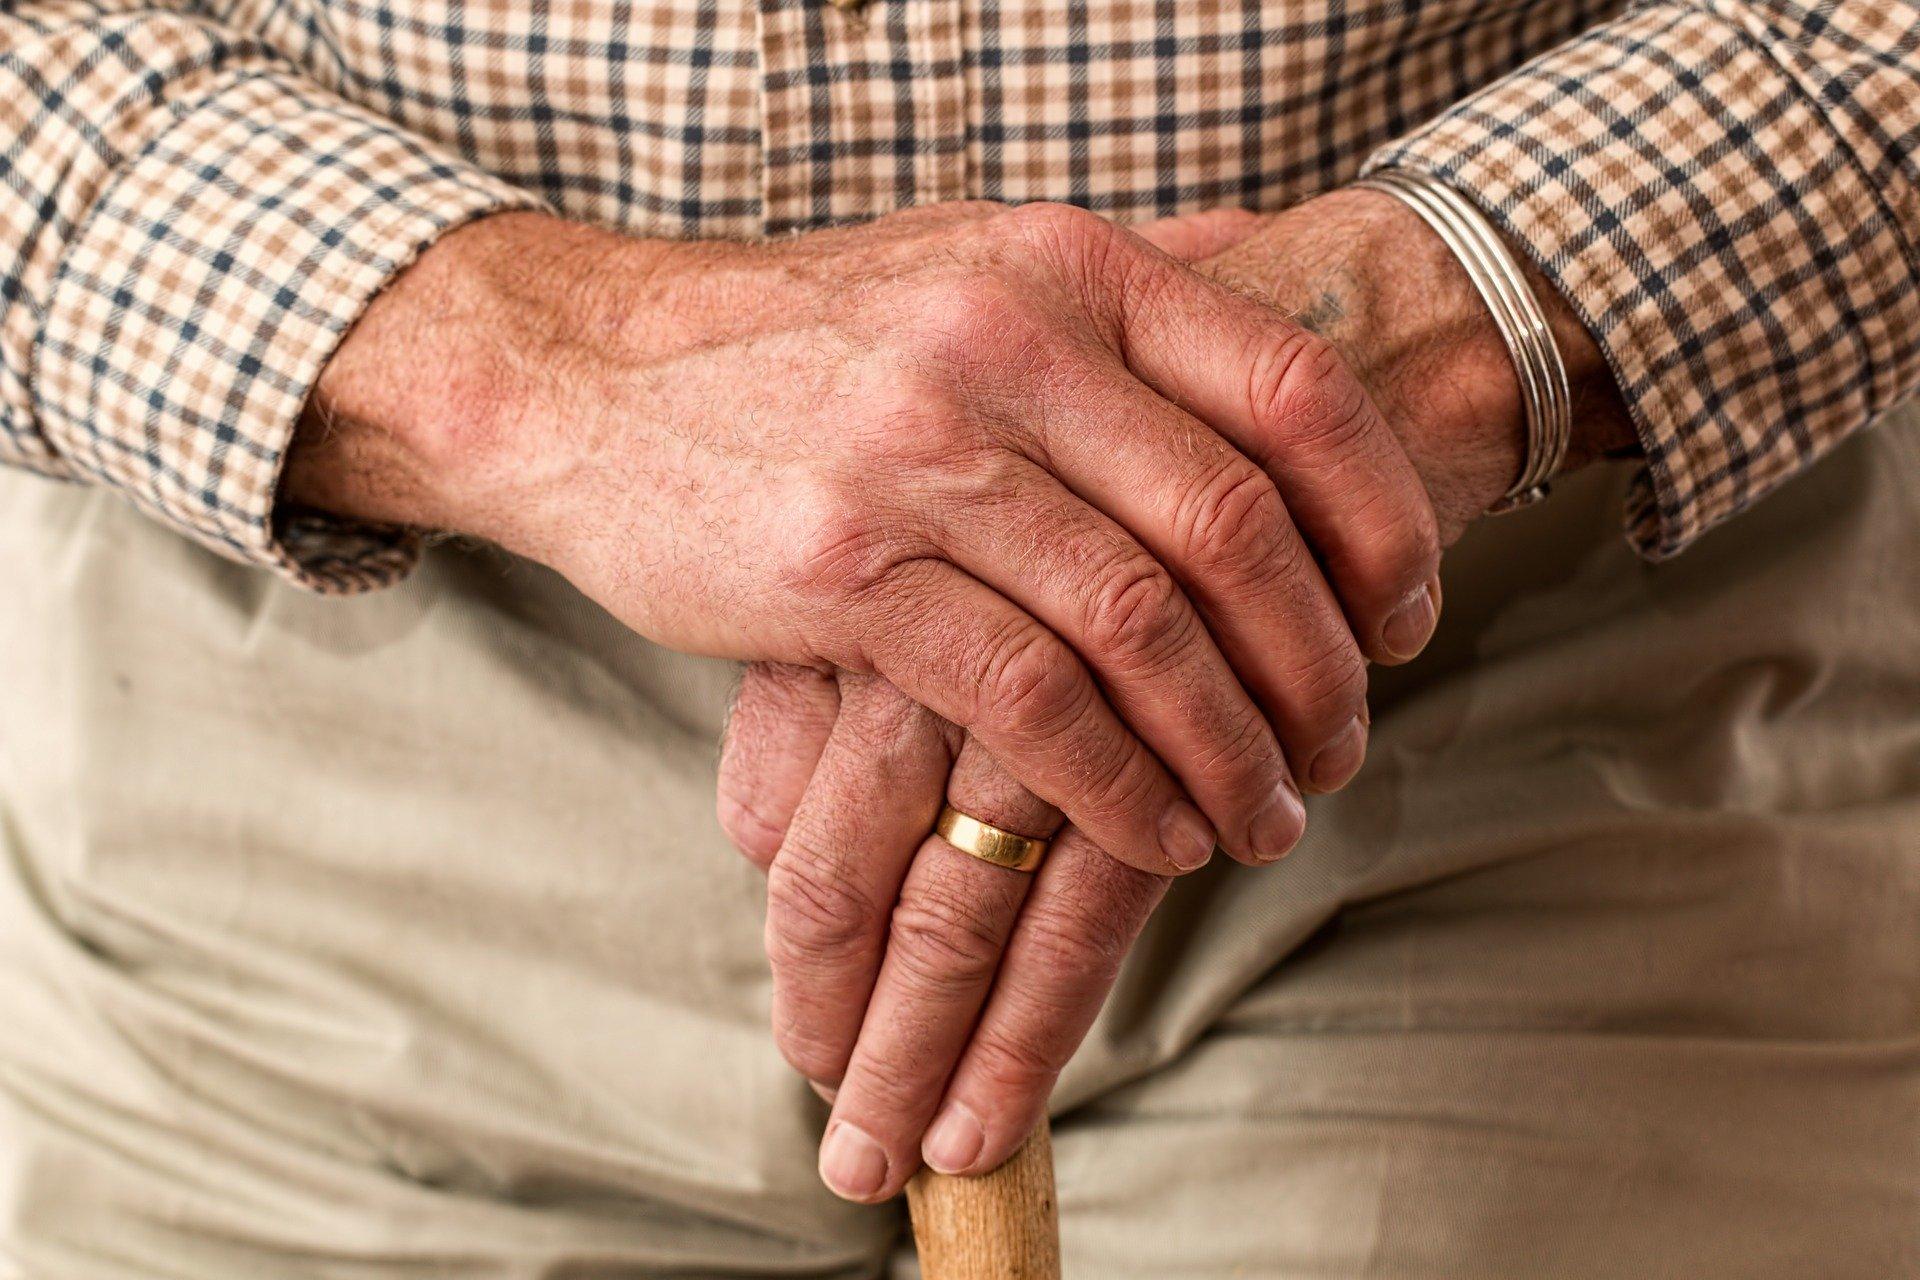 investissement-senior-lyon-actualite-bertrand-demanes